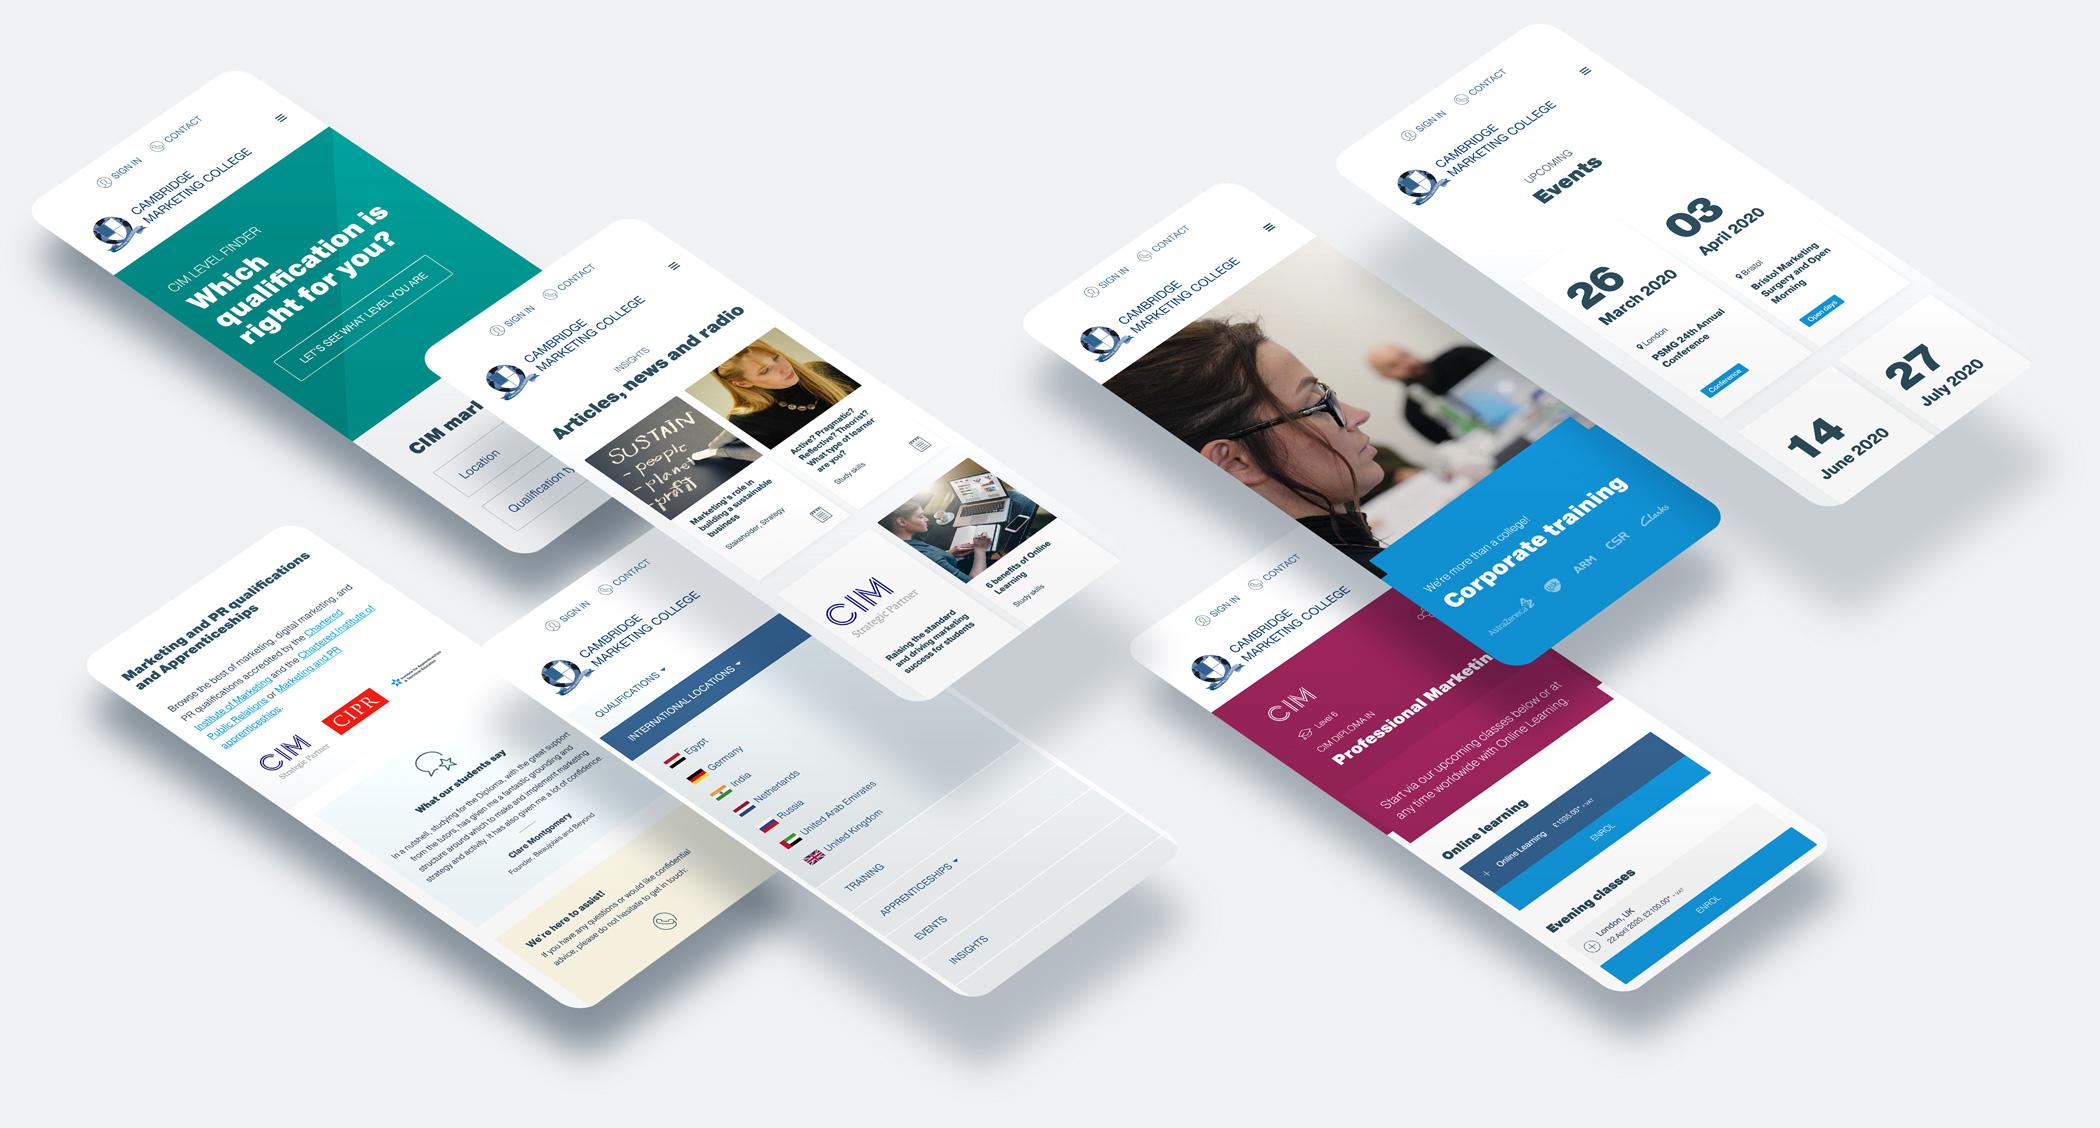 responsive-mobile-website